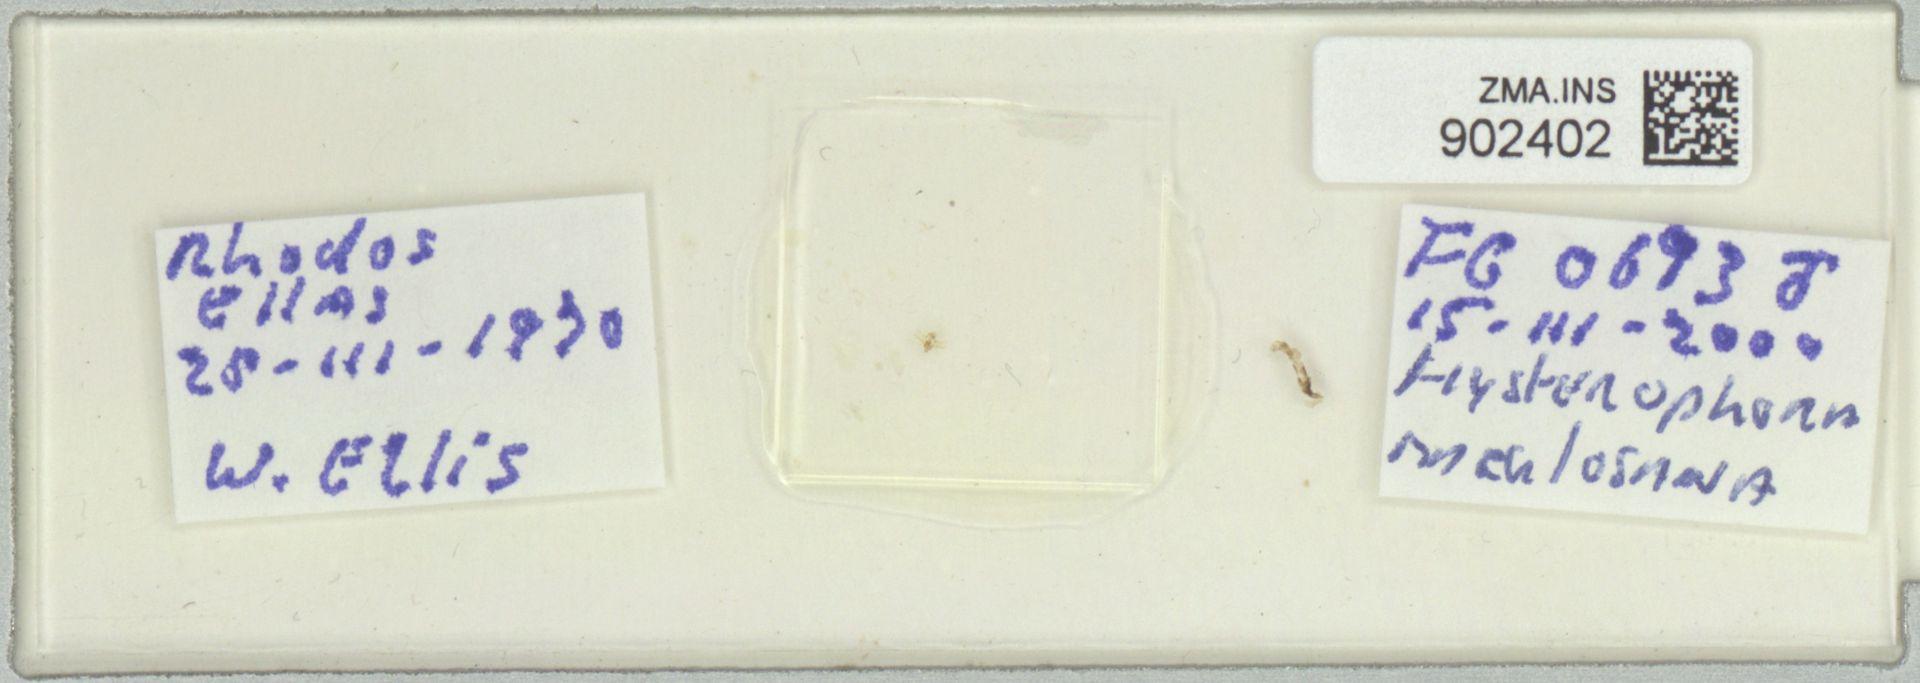 ZMA.INS.902402 | Hysterophora maculosana